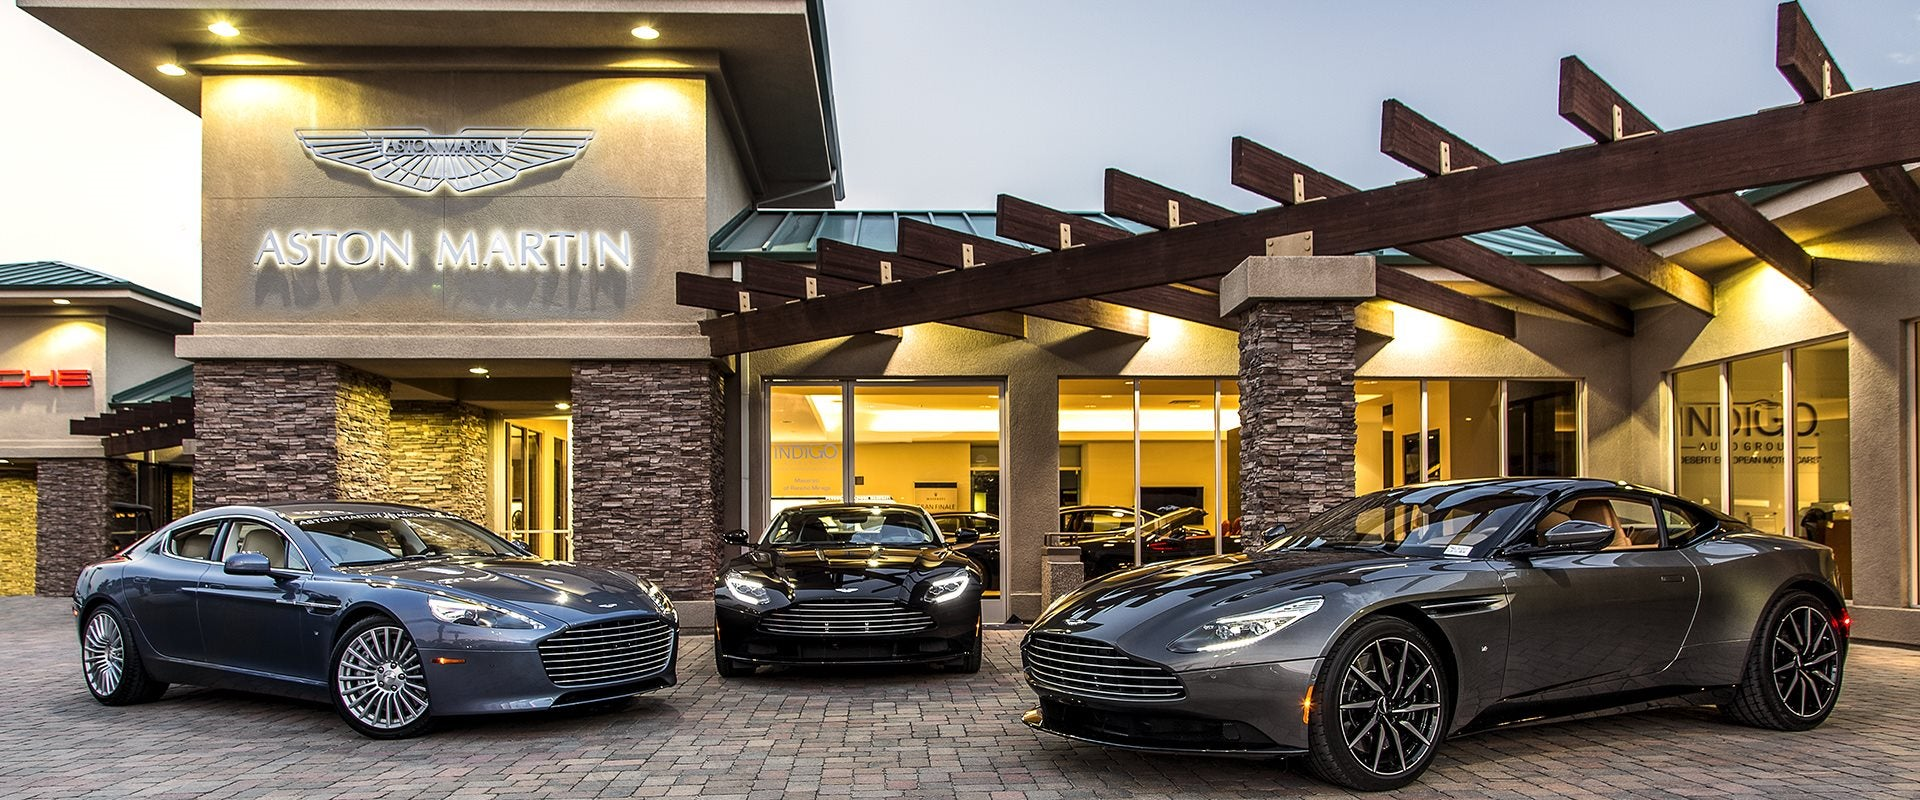 Guide To Luxury Motoring New Aston Martin Cars Near San Diego Ca